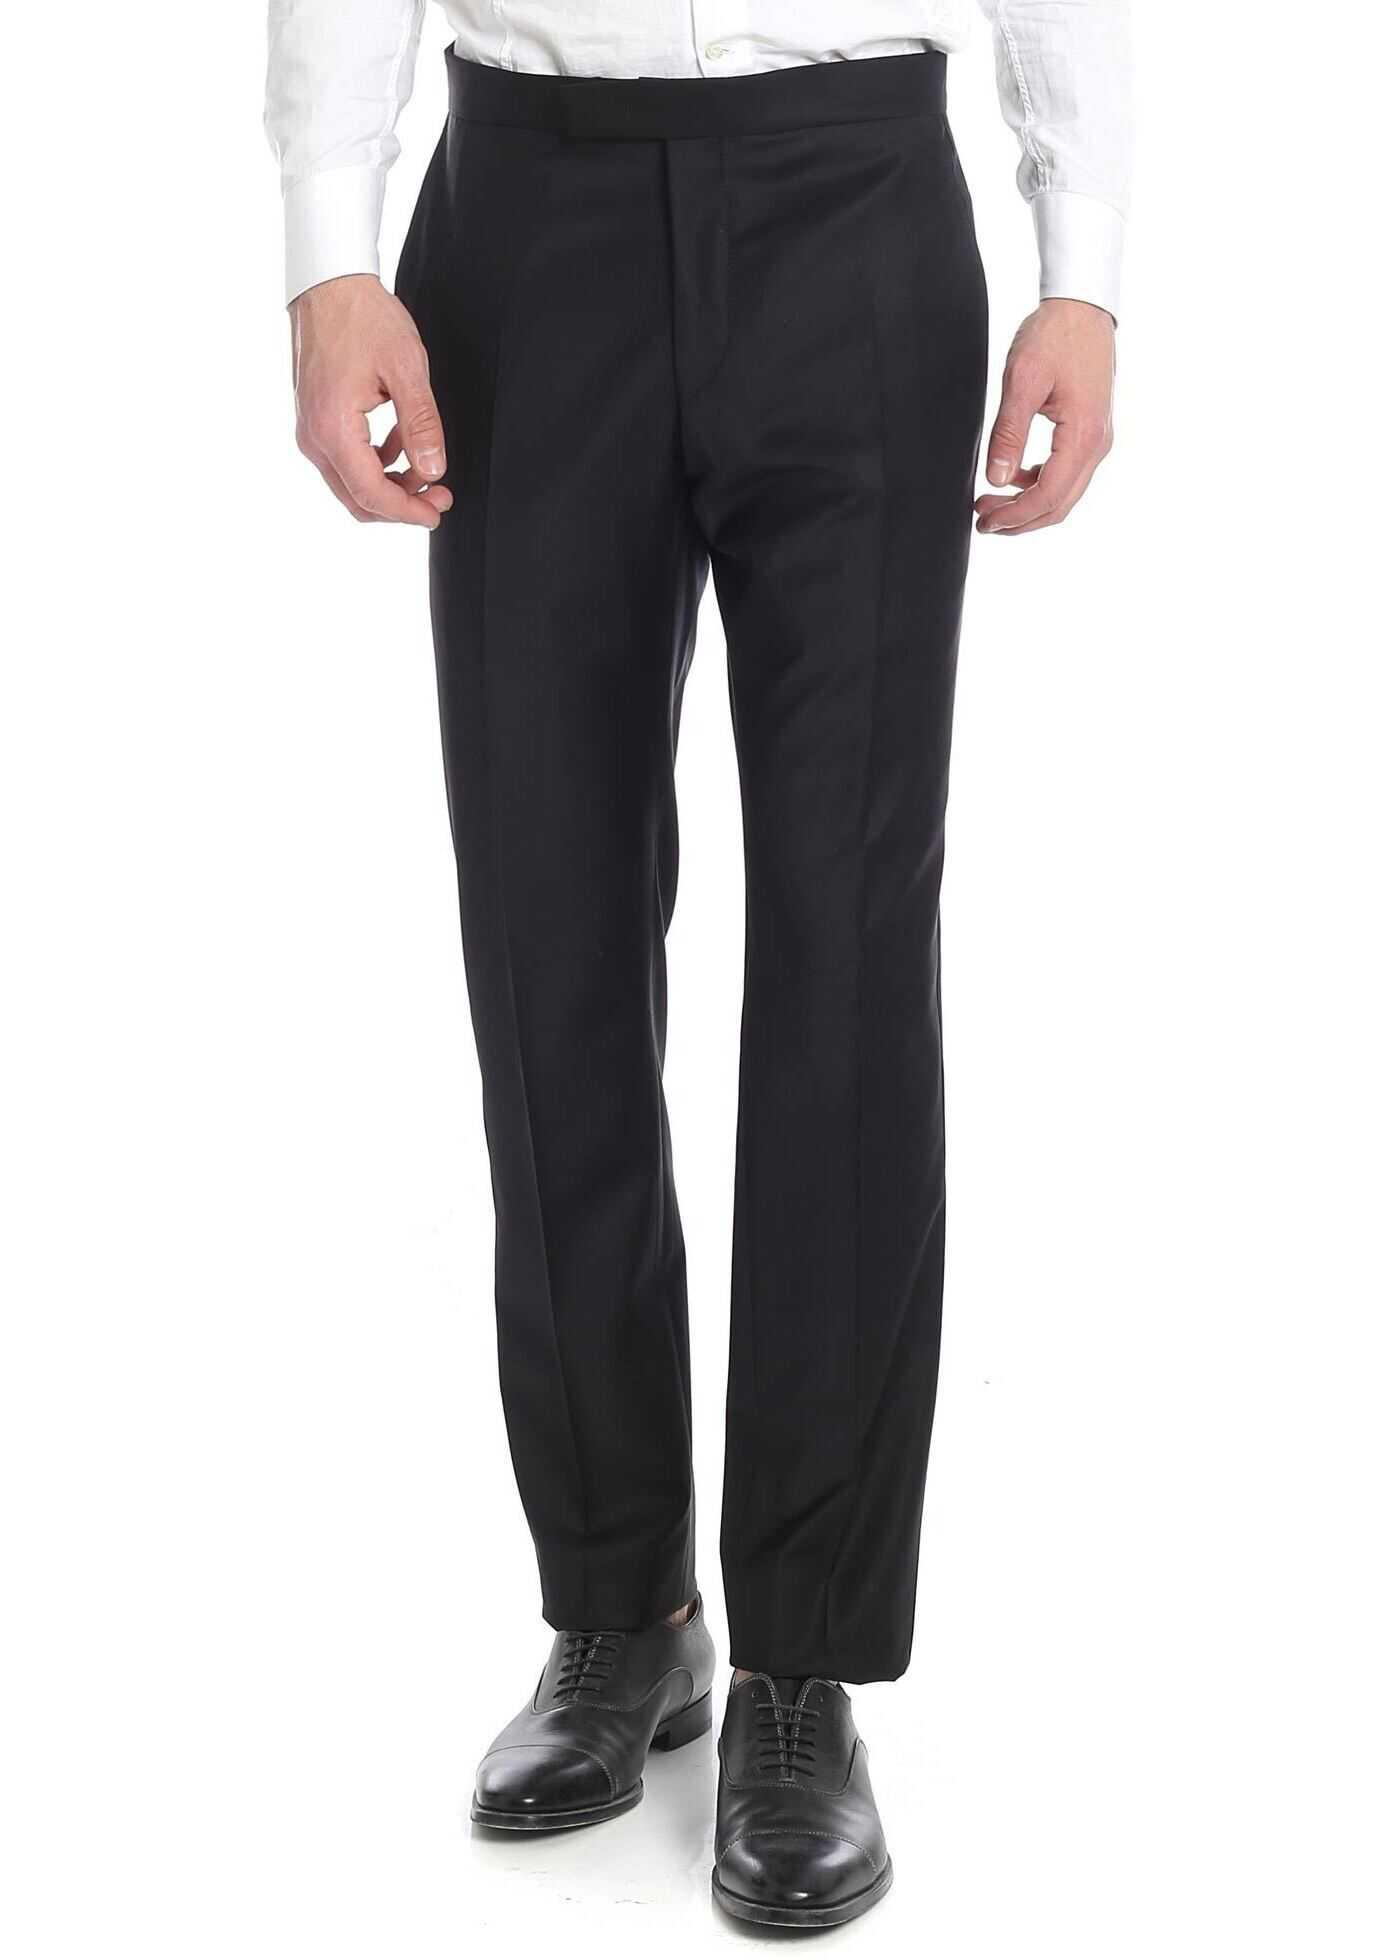 Karl Lagerfeld Classic Black Trousers Black imagine